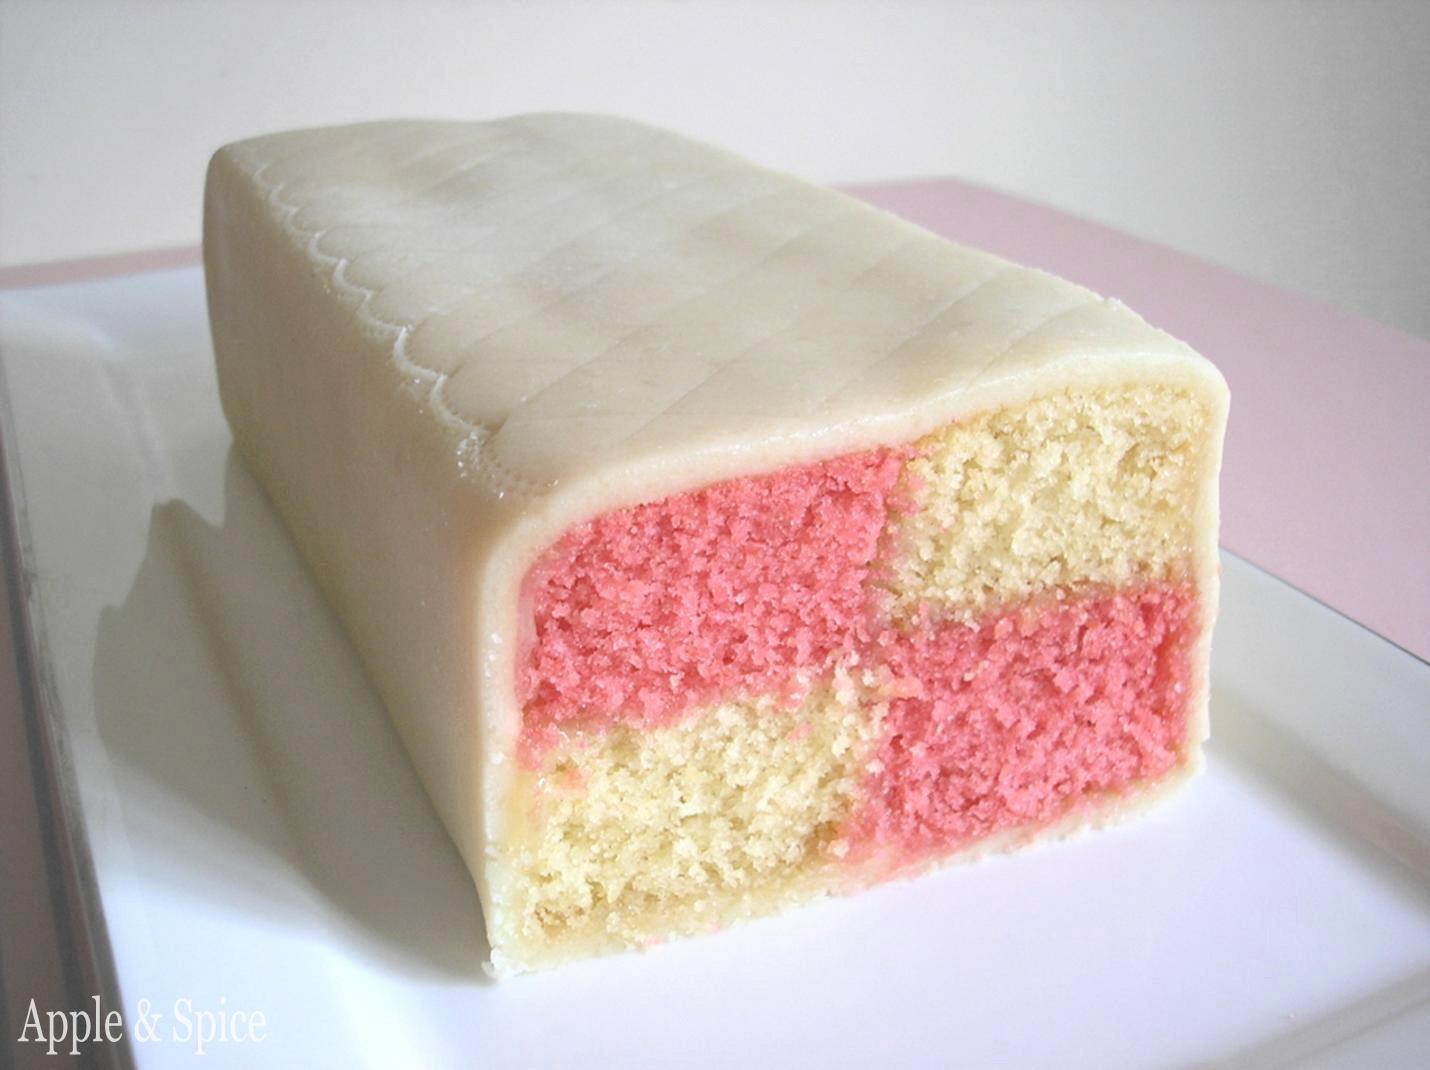 Ice Cream With Battenburg Cake